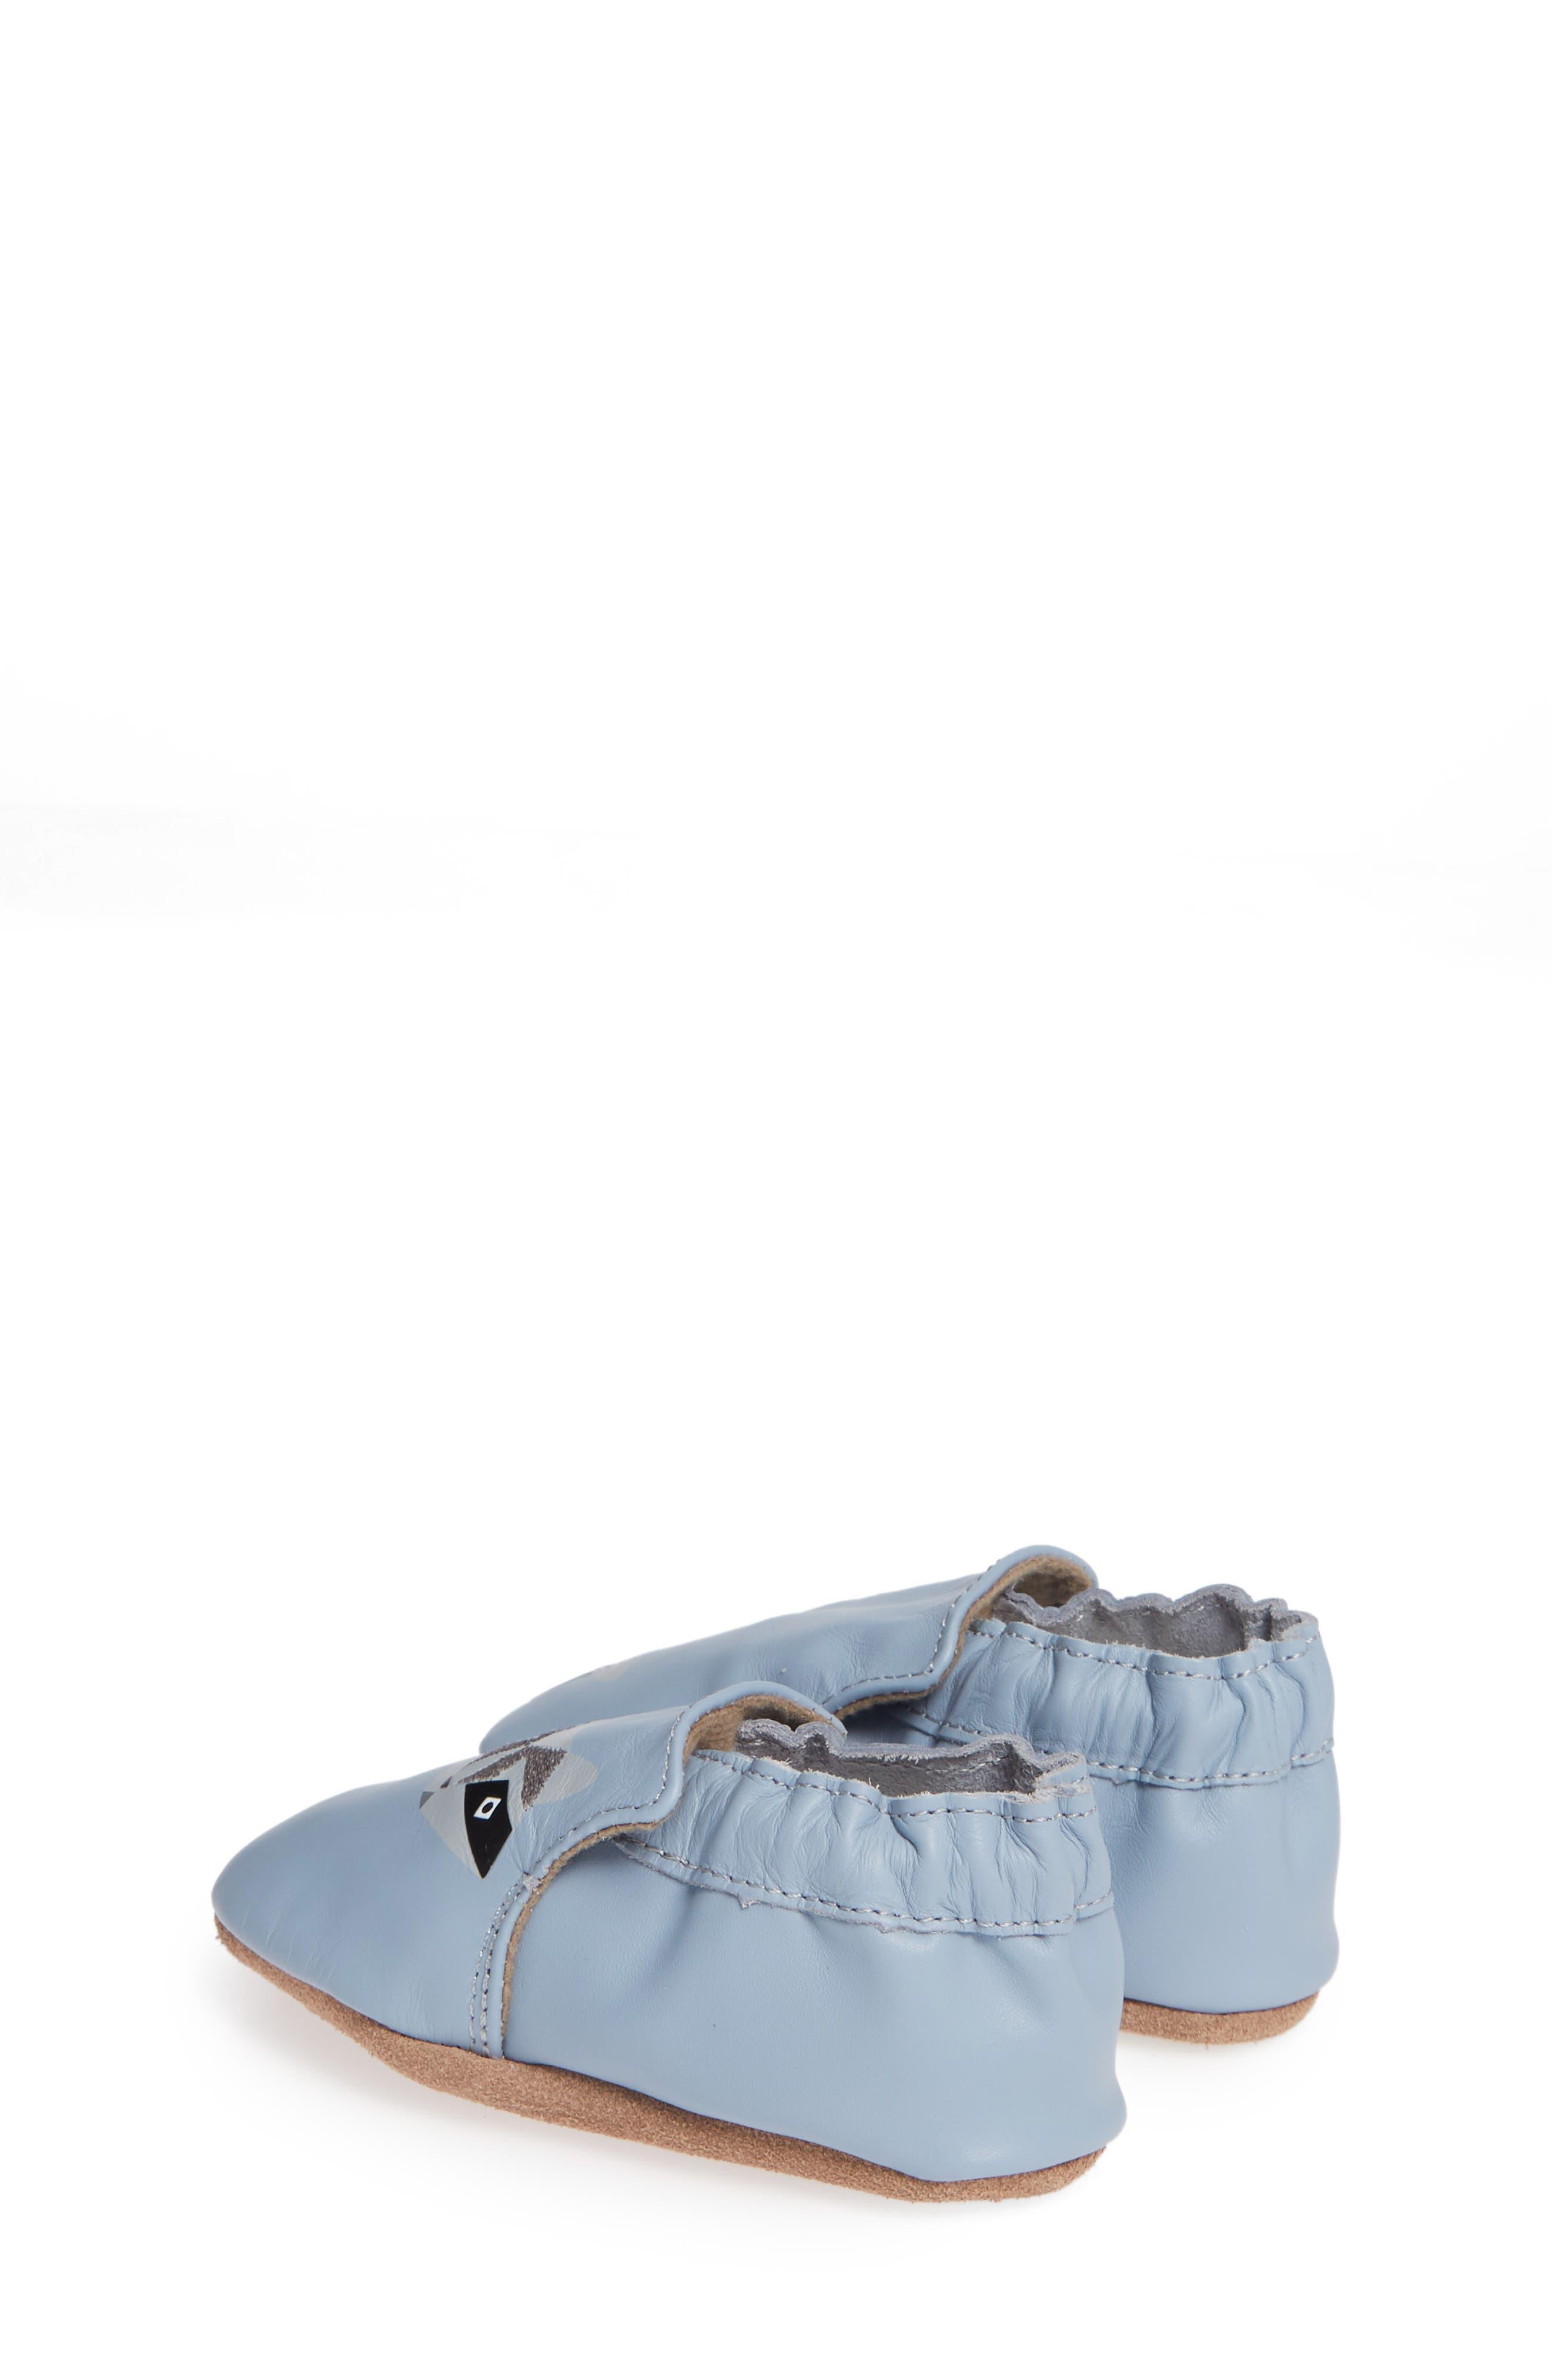 ROBEEZ<SUP>®</SUP>, Raccoon Buddies Crib Shoe, Alternate thumbnail 2, color, BLUE